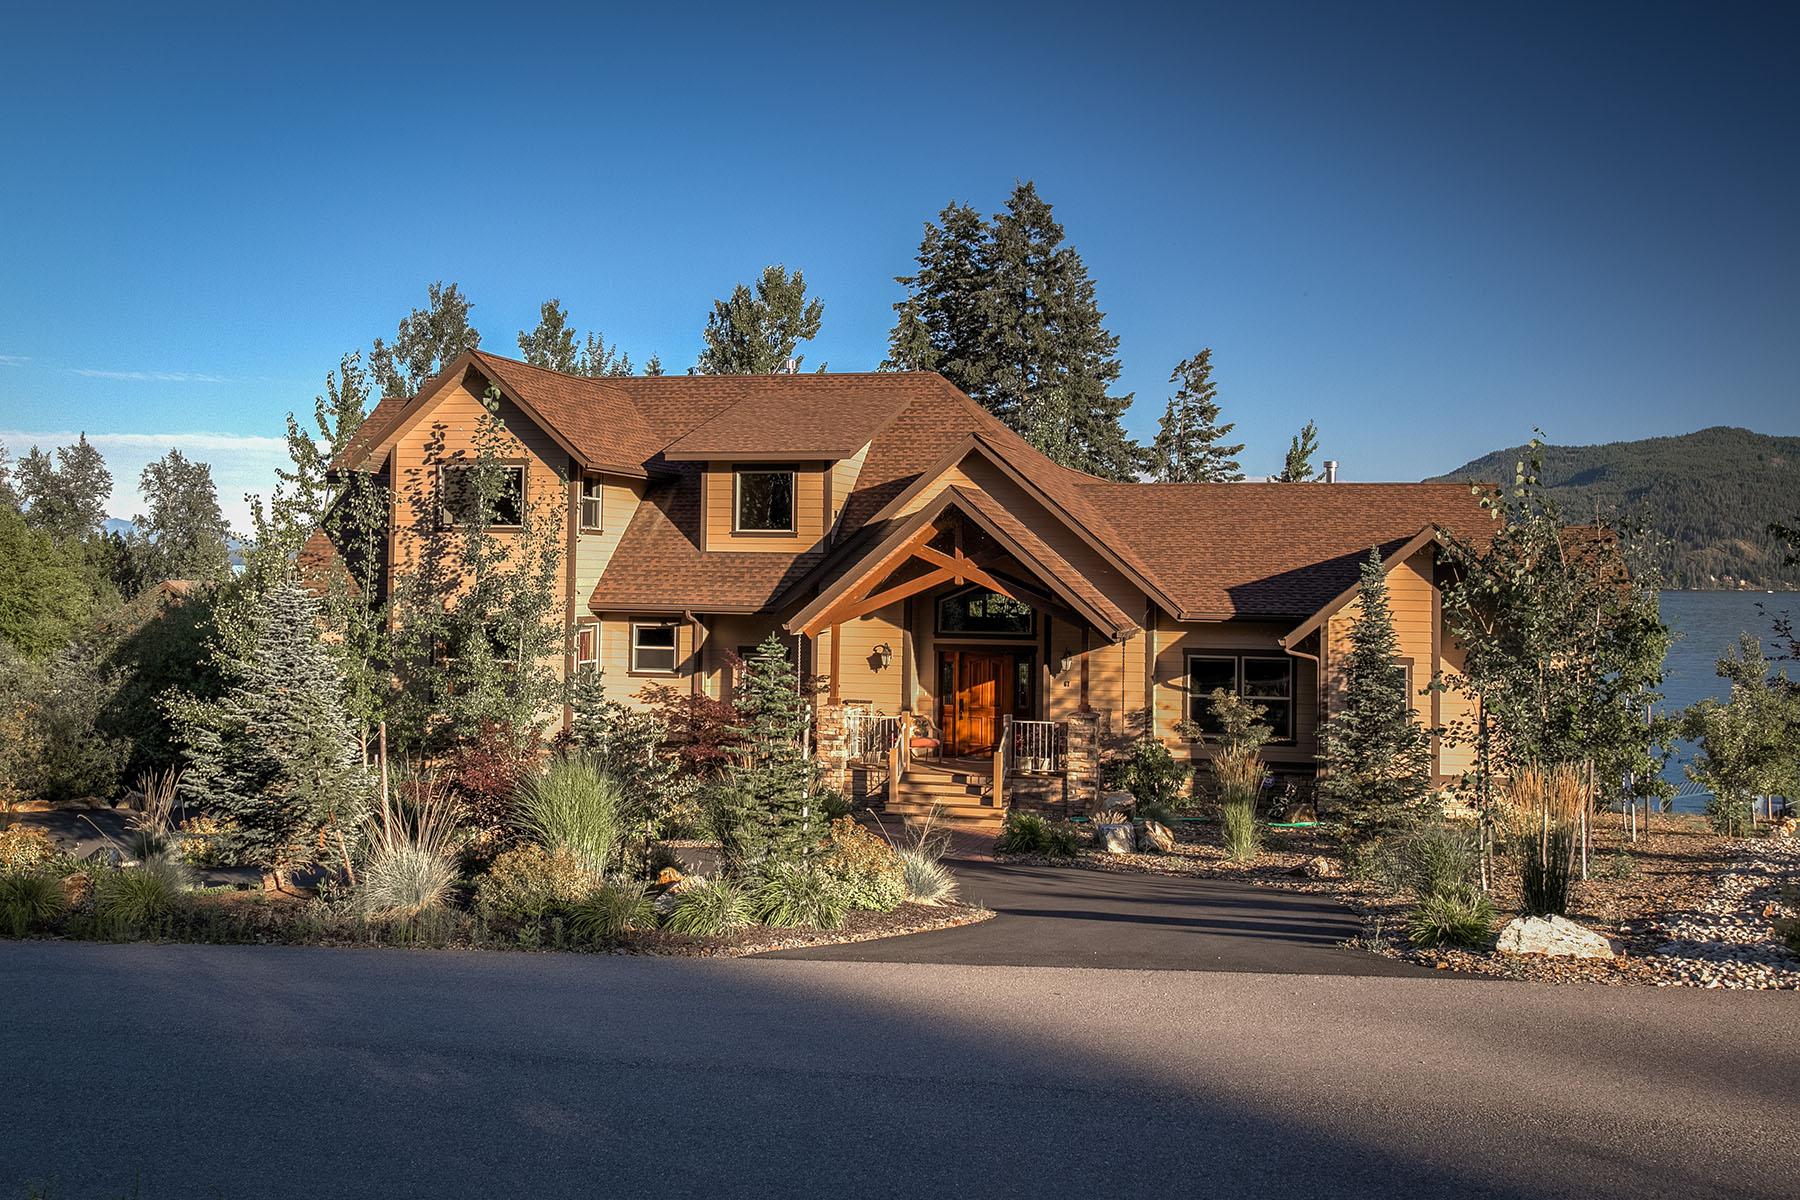 Single Family Home for Sale at Ponder Point Lane 67 Ponder Point Lane Sandpoint, Idaho, 83864 United States